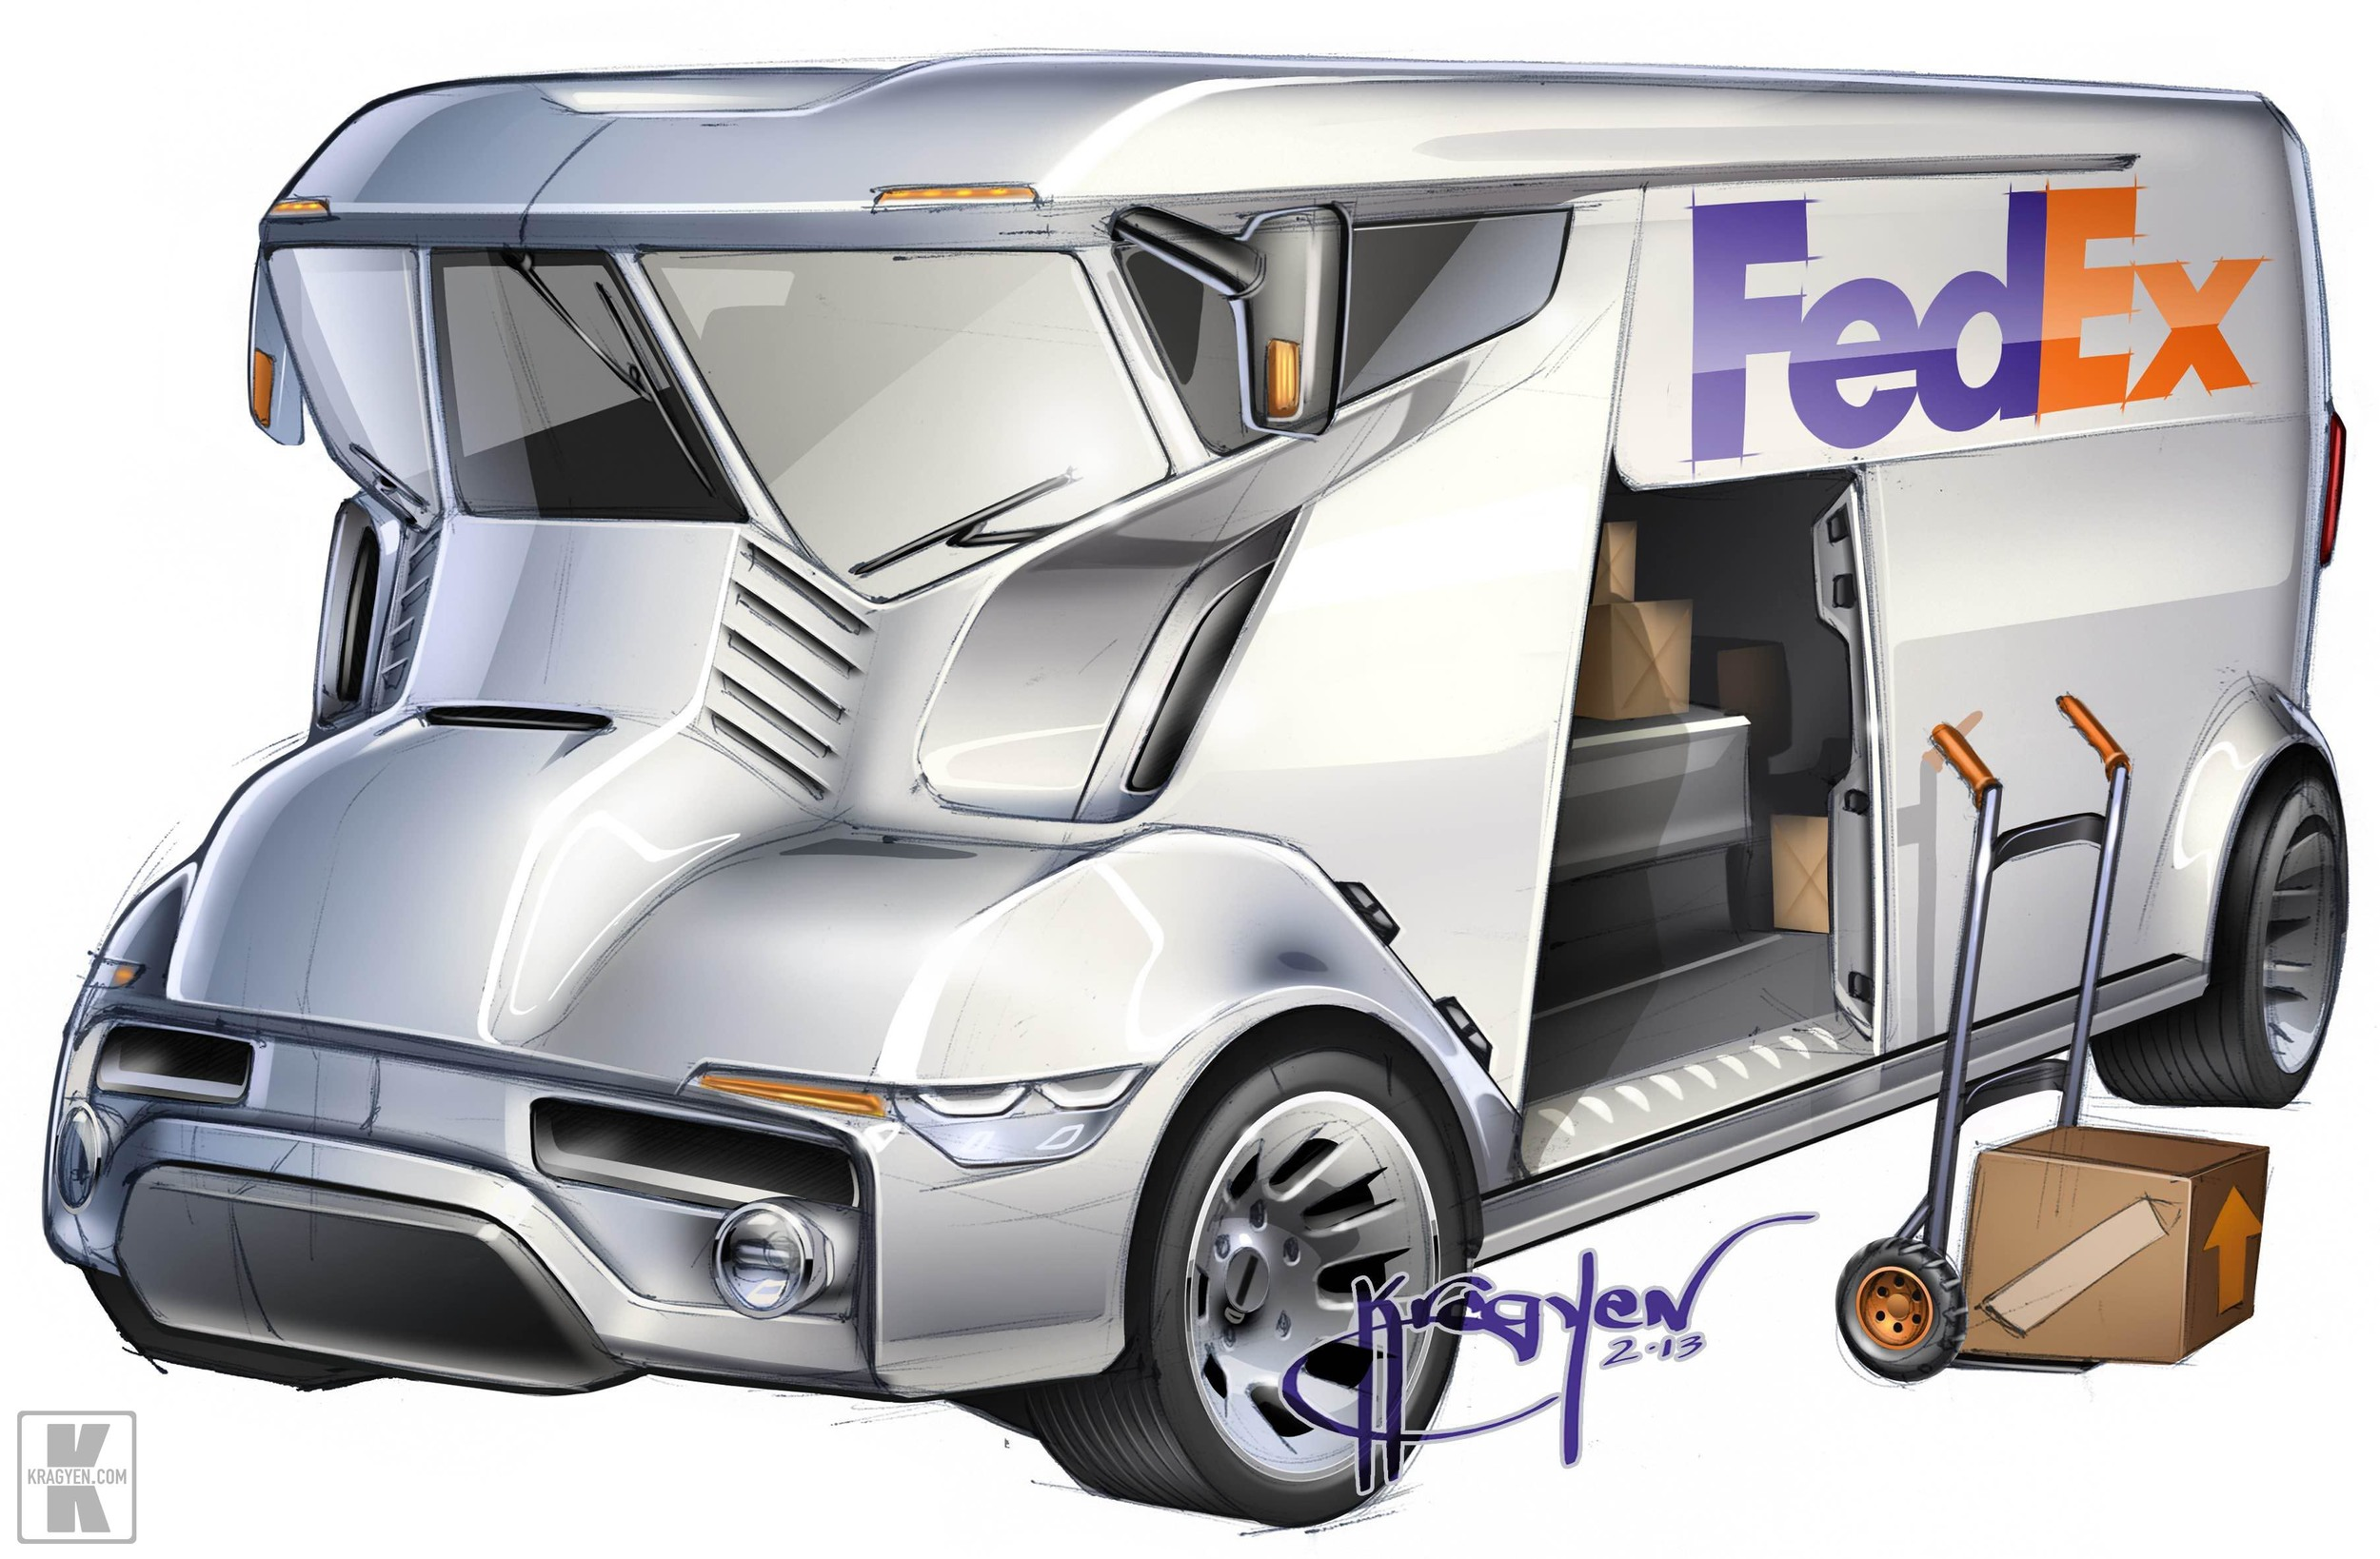 FedExTruck.jpg